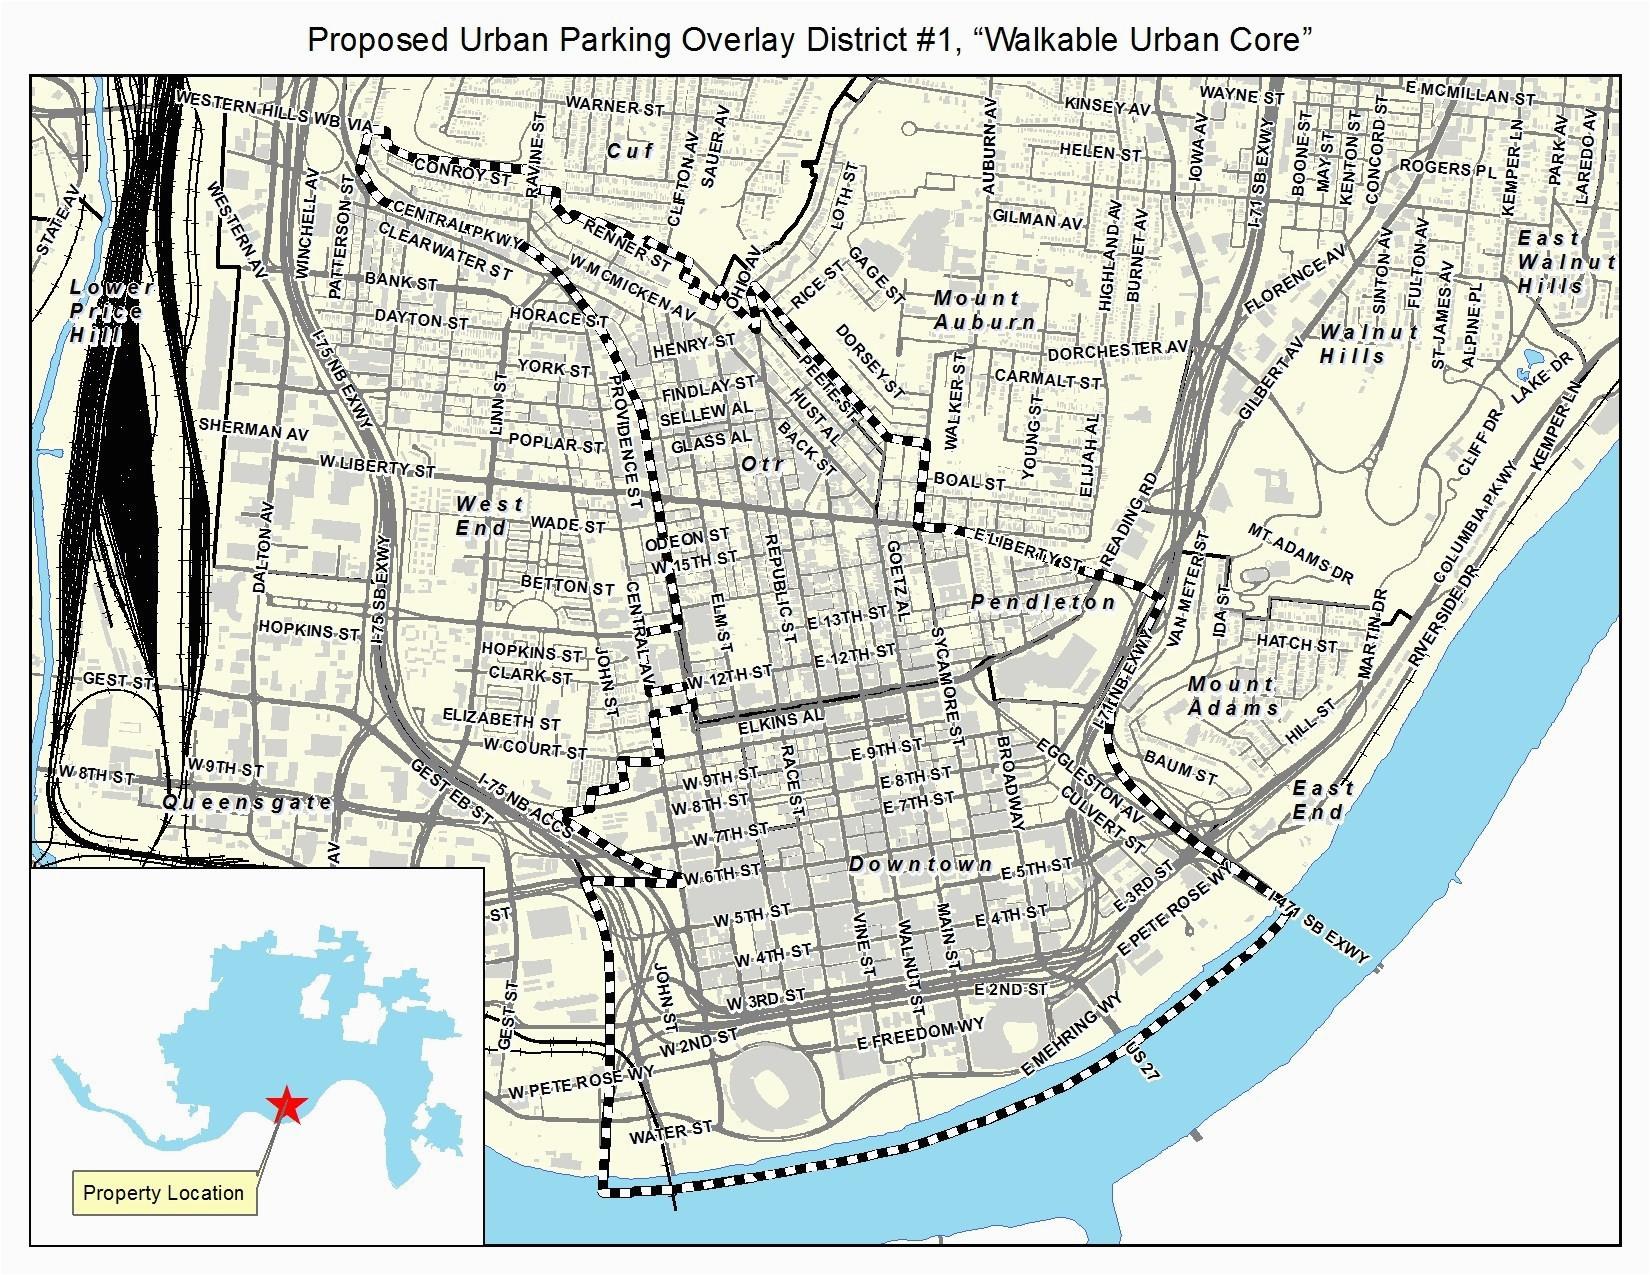 Map Of Downtown Cincinnati Ohio | secretmuseum Map Cincinnati on midwest map, cincinnati reds, st. louis map, los angeles map, downtown cincinnati, ohio river, masury map, kentucky map, ohio map, cincinnati bengals, cincinnati/northern kentucky international airport, minneapolis map, hamilton county neighborhood map, hamilton county, fairfield map, montgomery oh map, university of cincinnati, milwaukee map, columbus map, indianapolis map, cleveland map, jakarta map, maine map, chicago map, nyc map, new orleans map, pittsburgh map, john a. roebling suspension bridge,